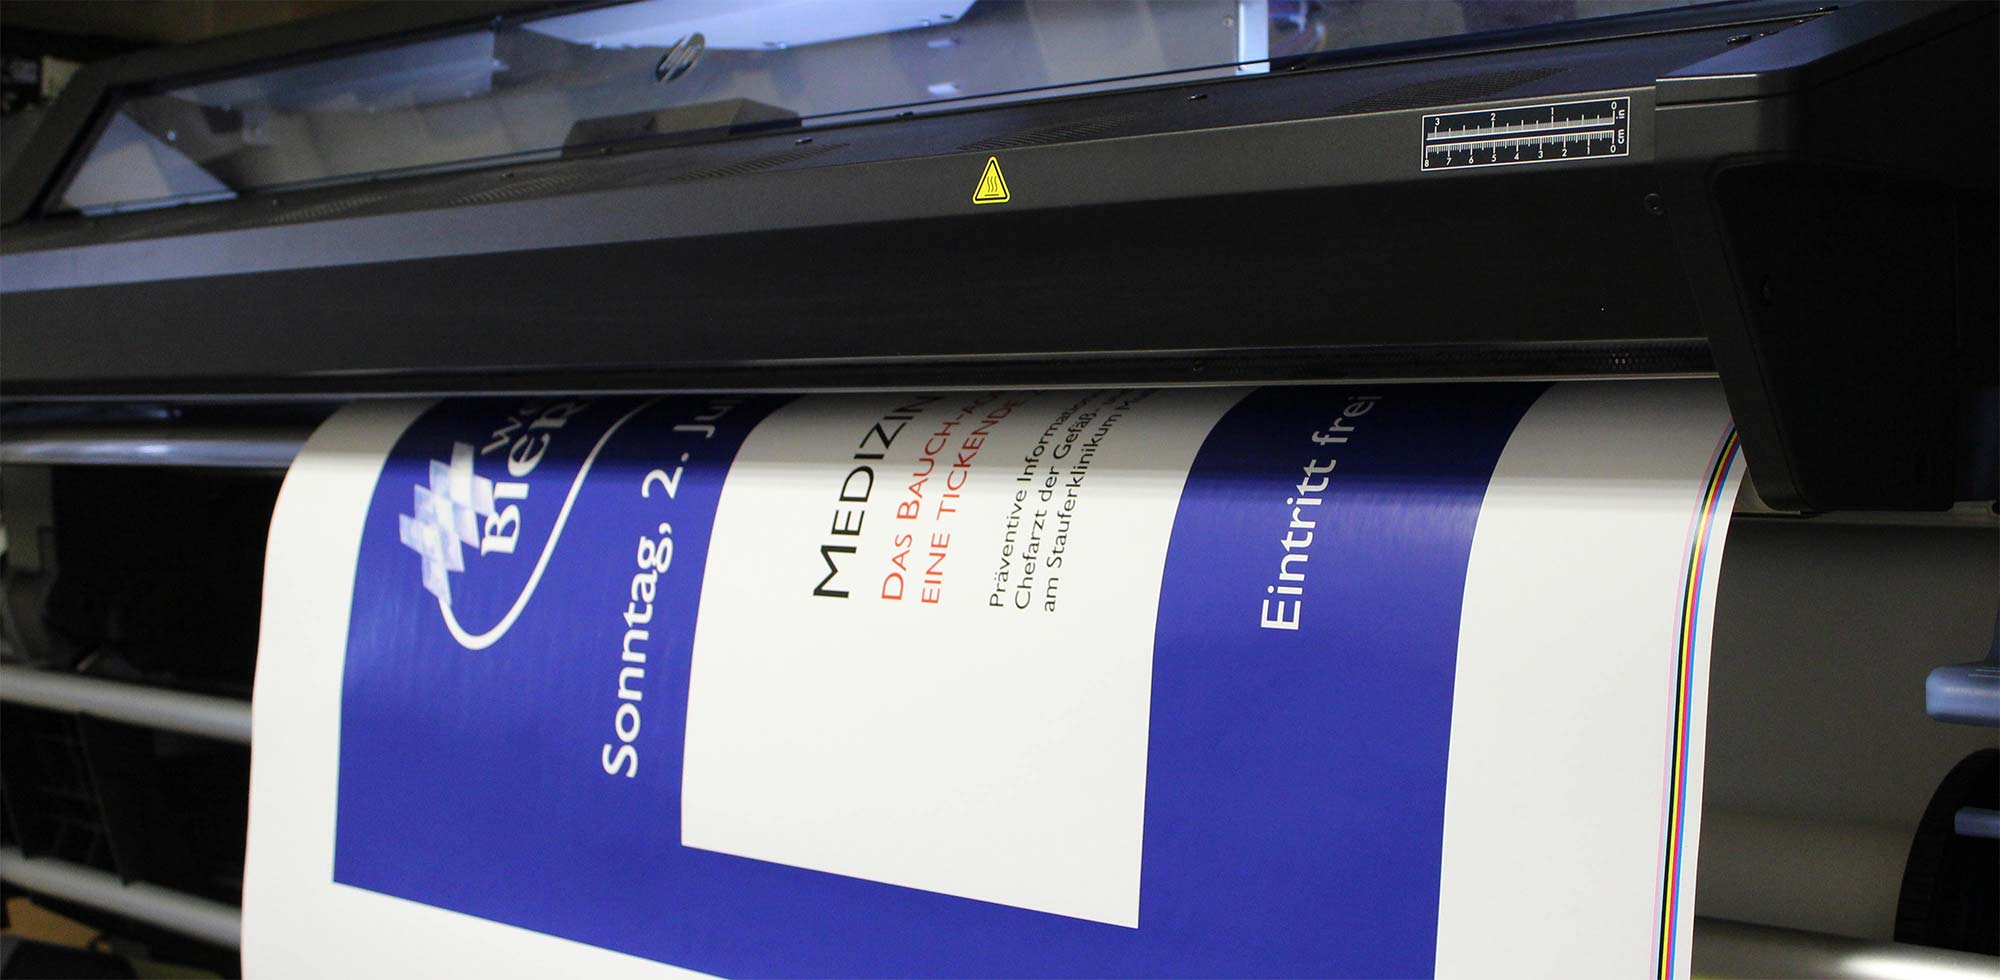 Digital Latexdruck GIRAFFIKKA 73642 Welzheim Rudersberger Str. 14